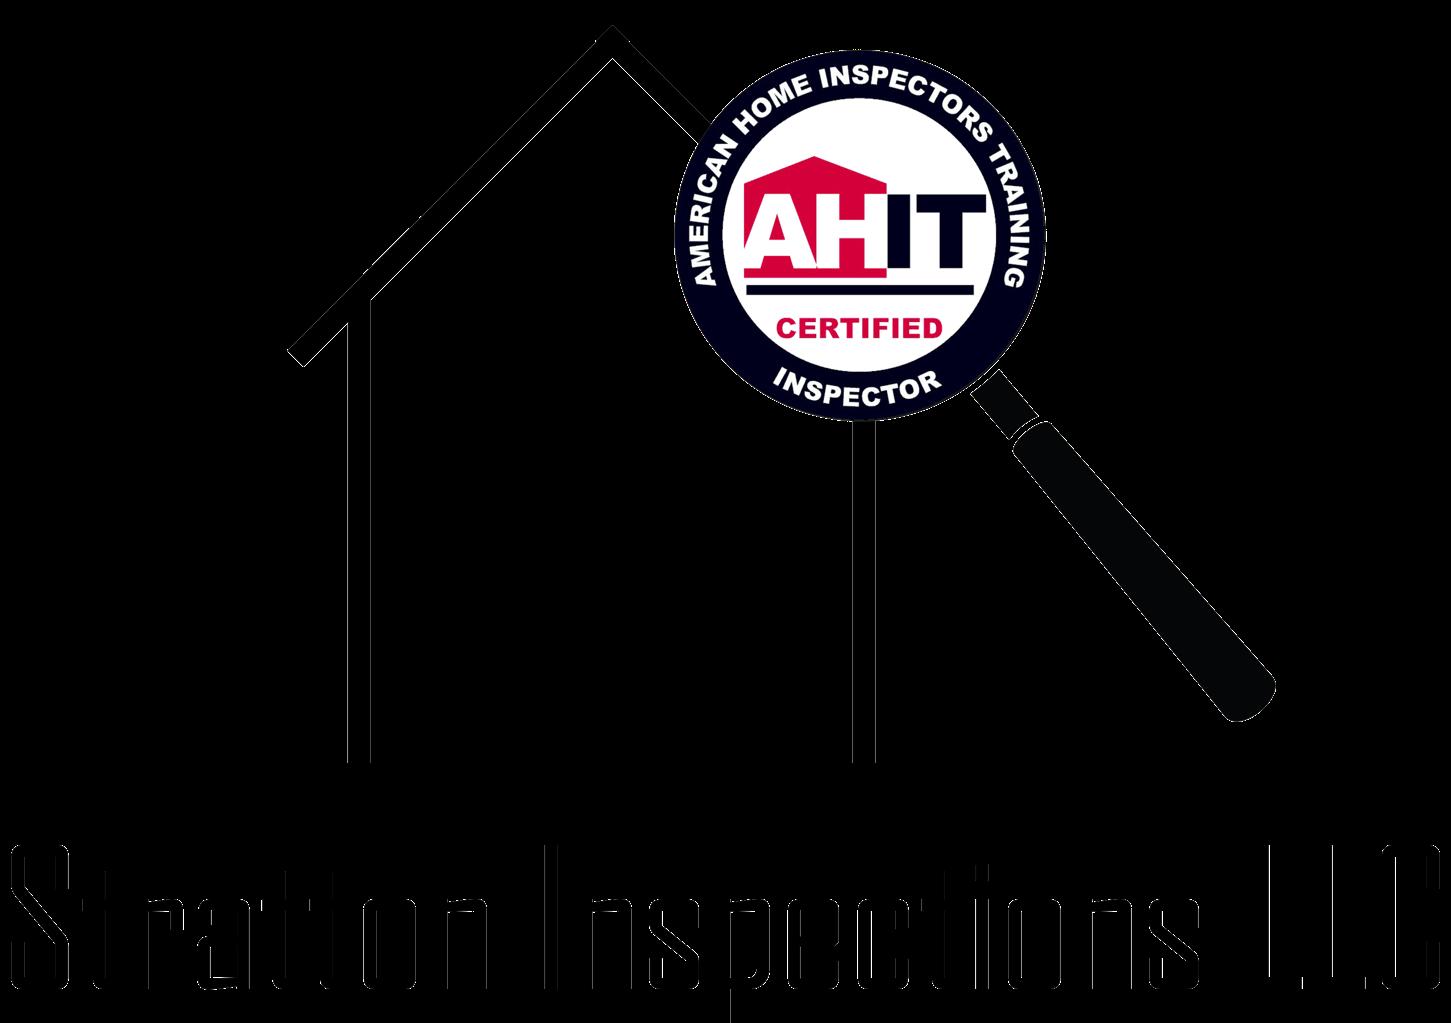 Stratton Inspections, LLC